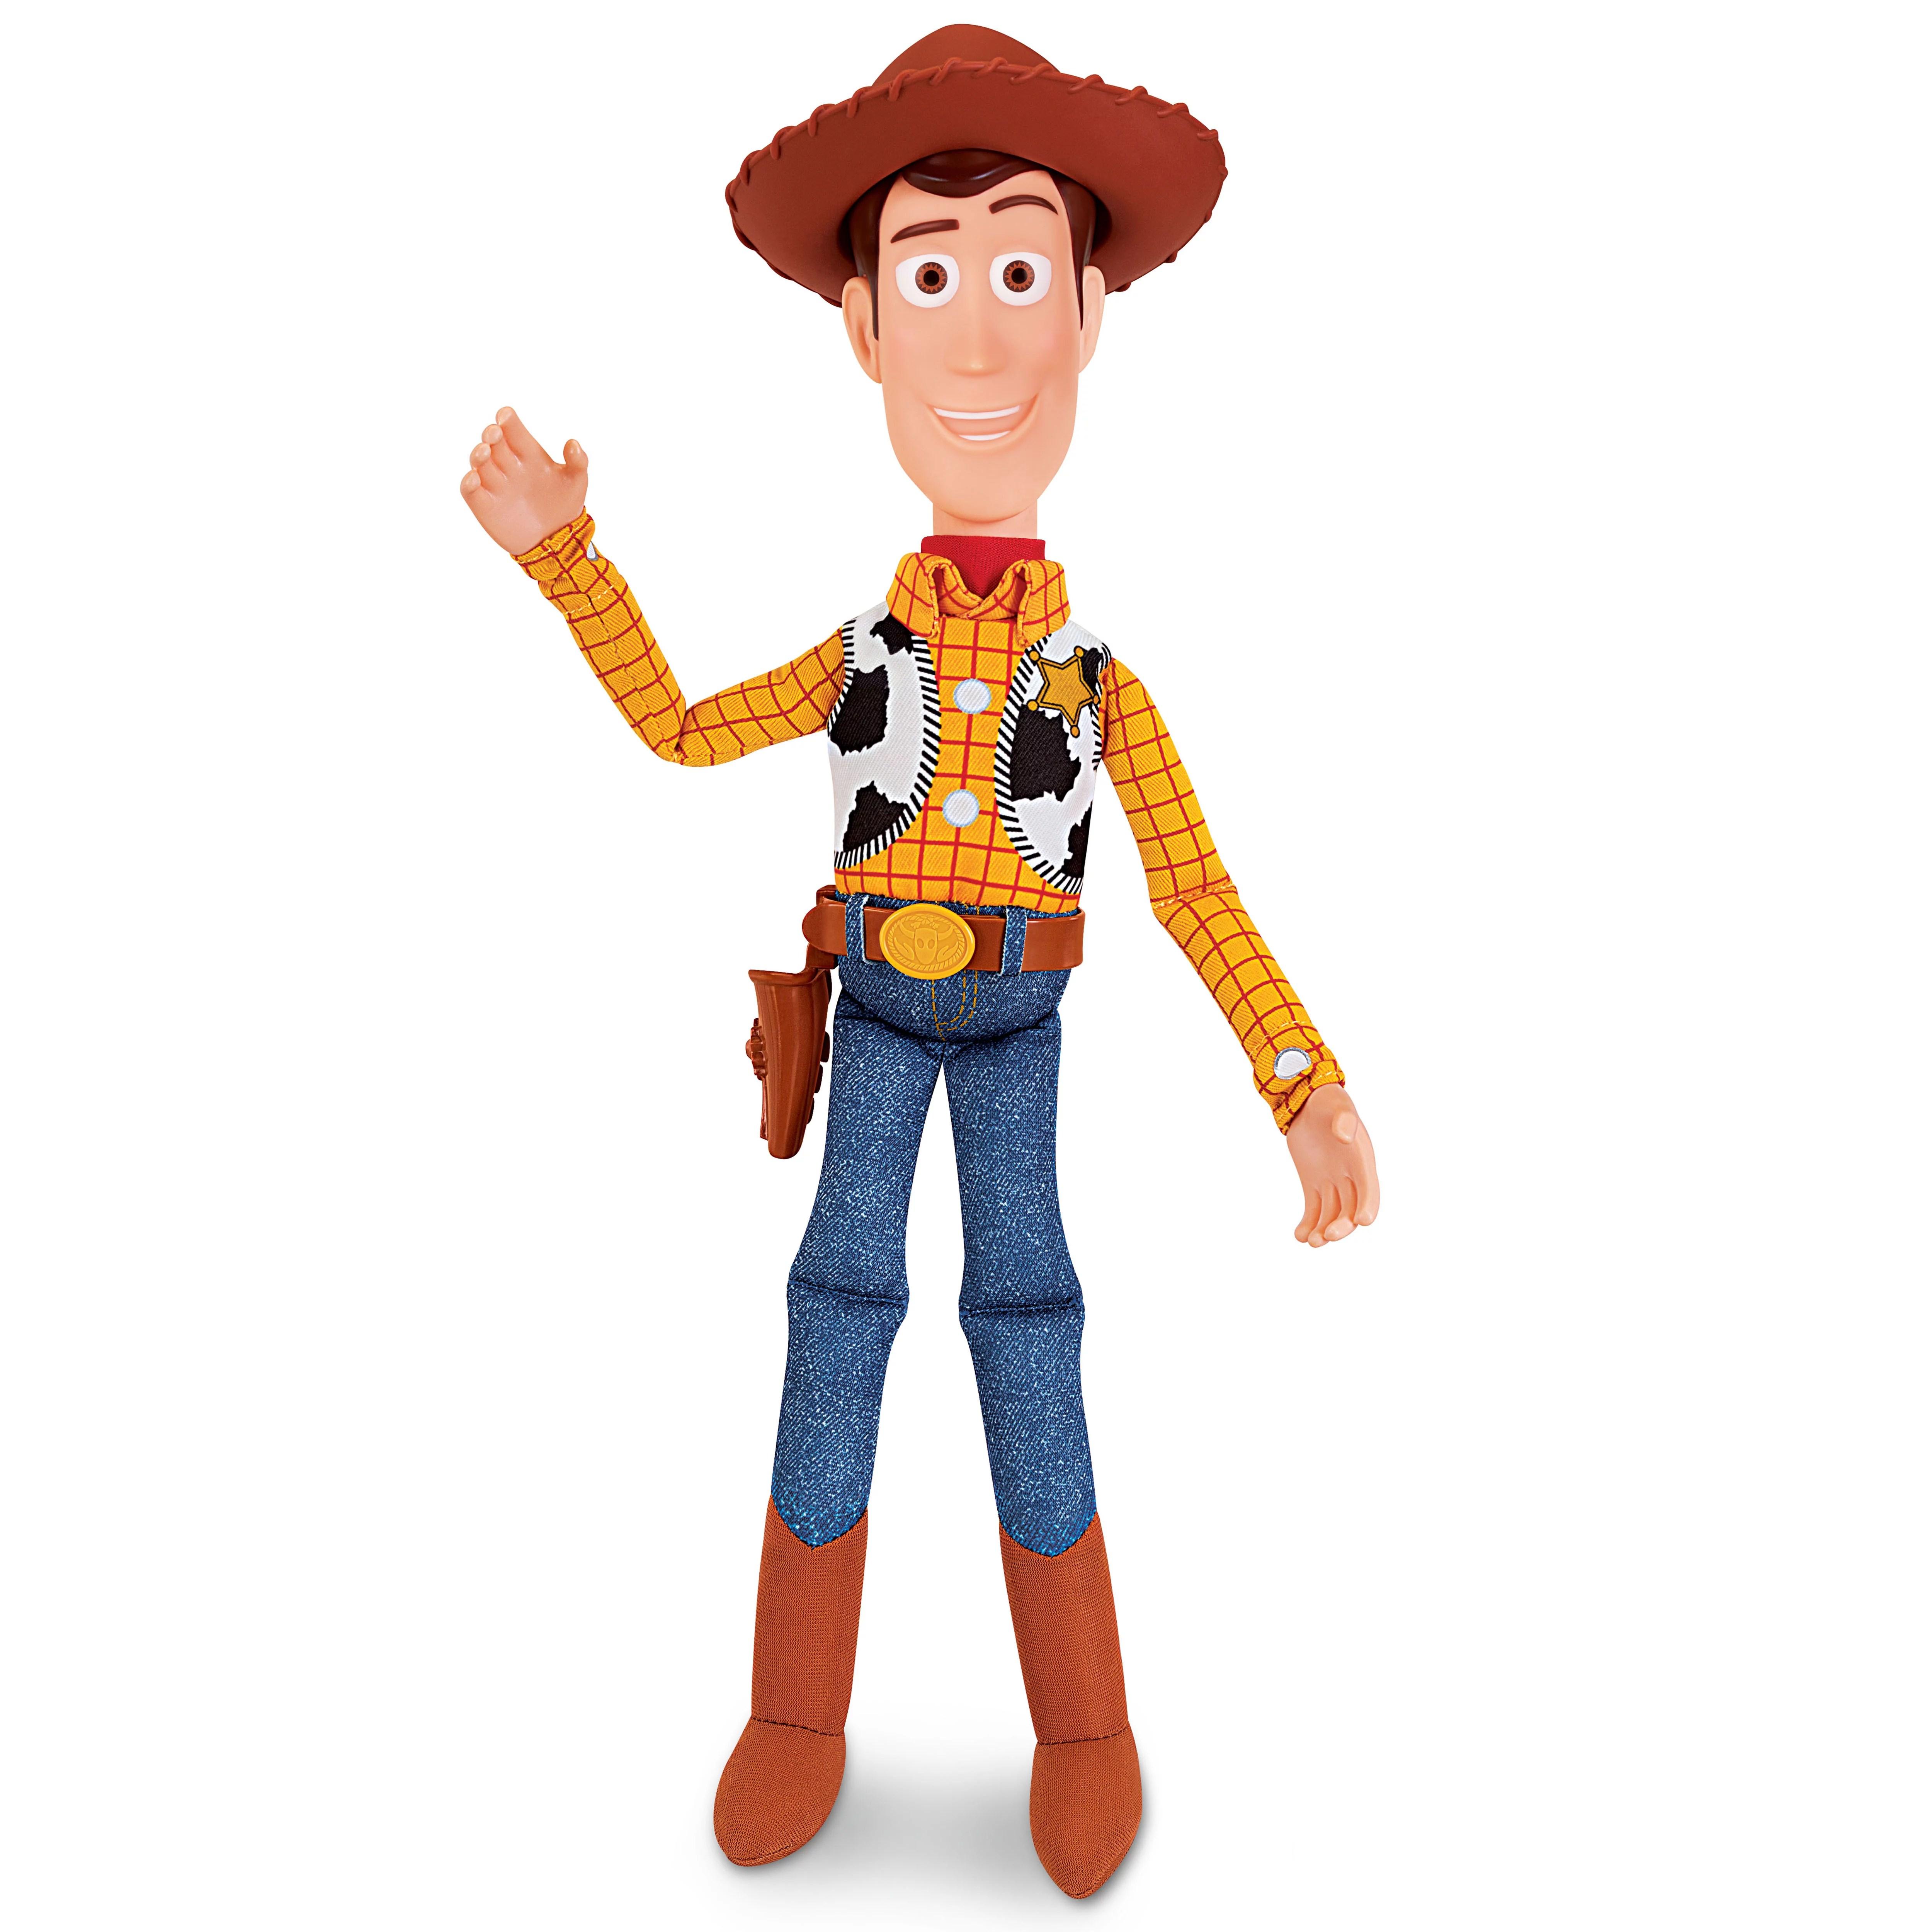 Disney Pixar Toy Story Woody Talking Action Figure